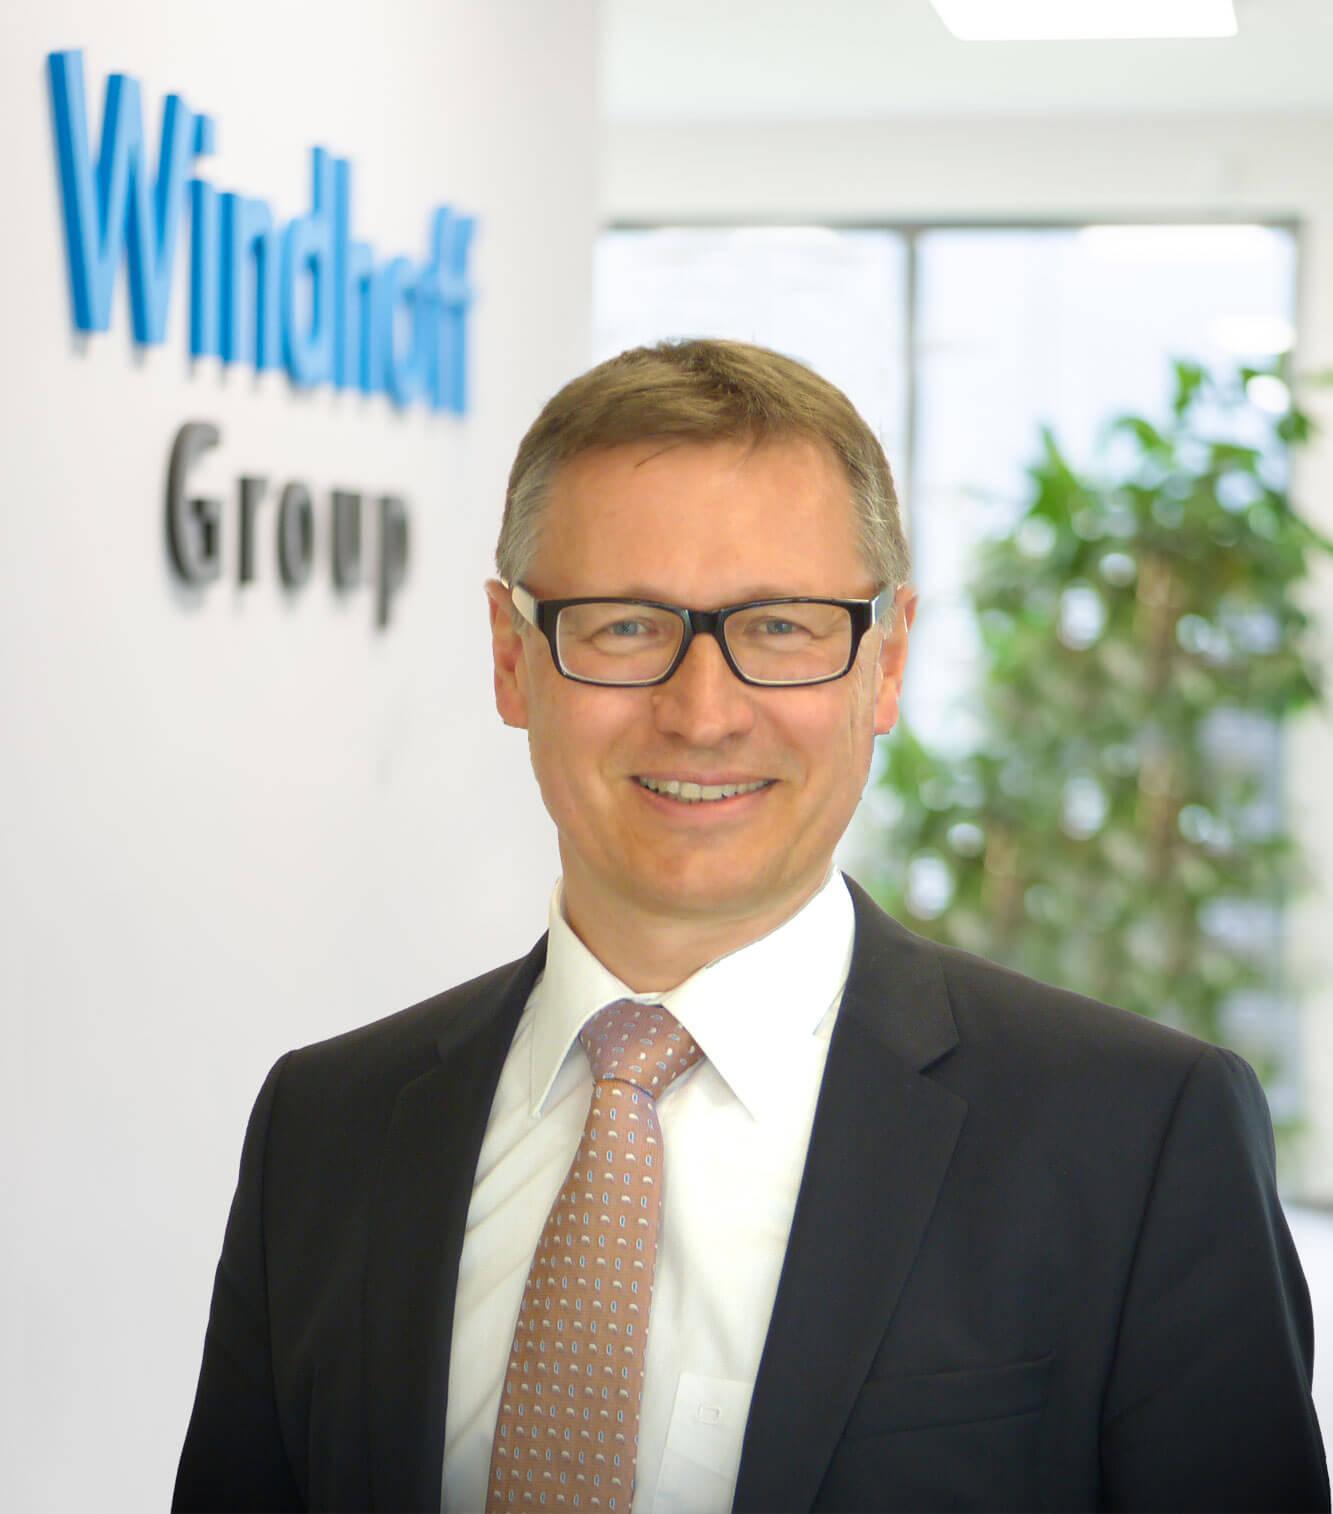 Hans-ulrich Breme Windhoff Devops